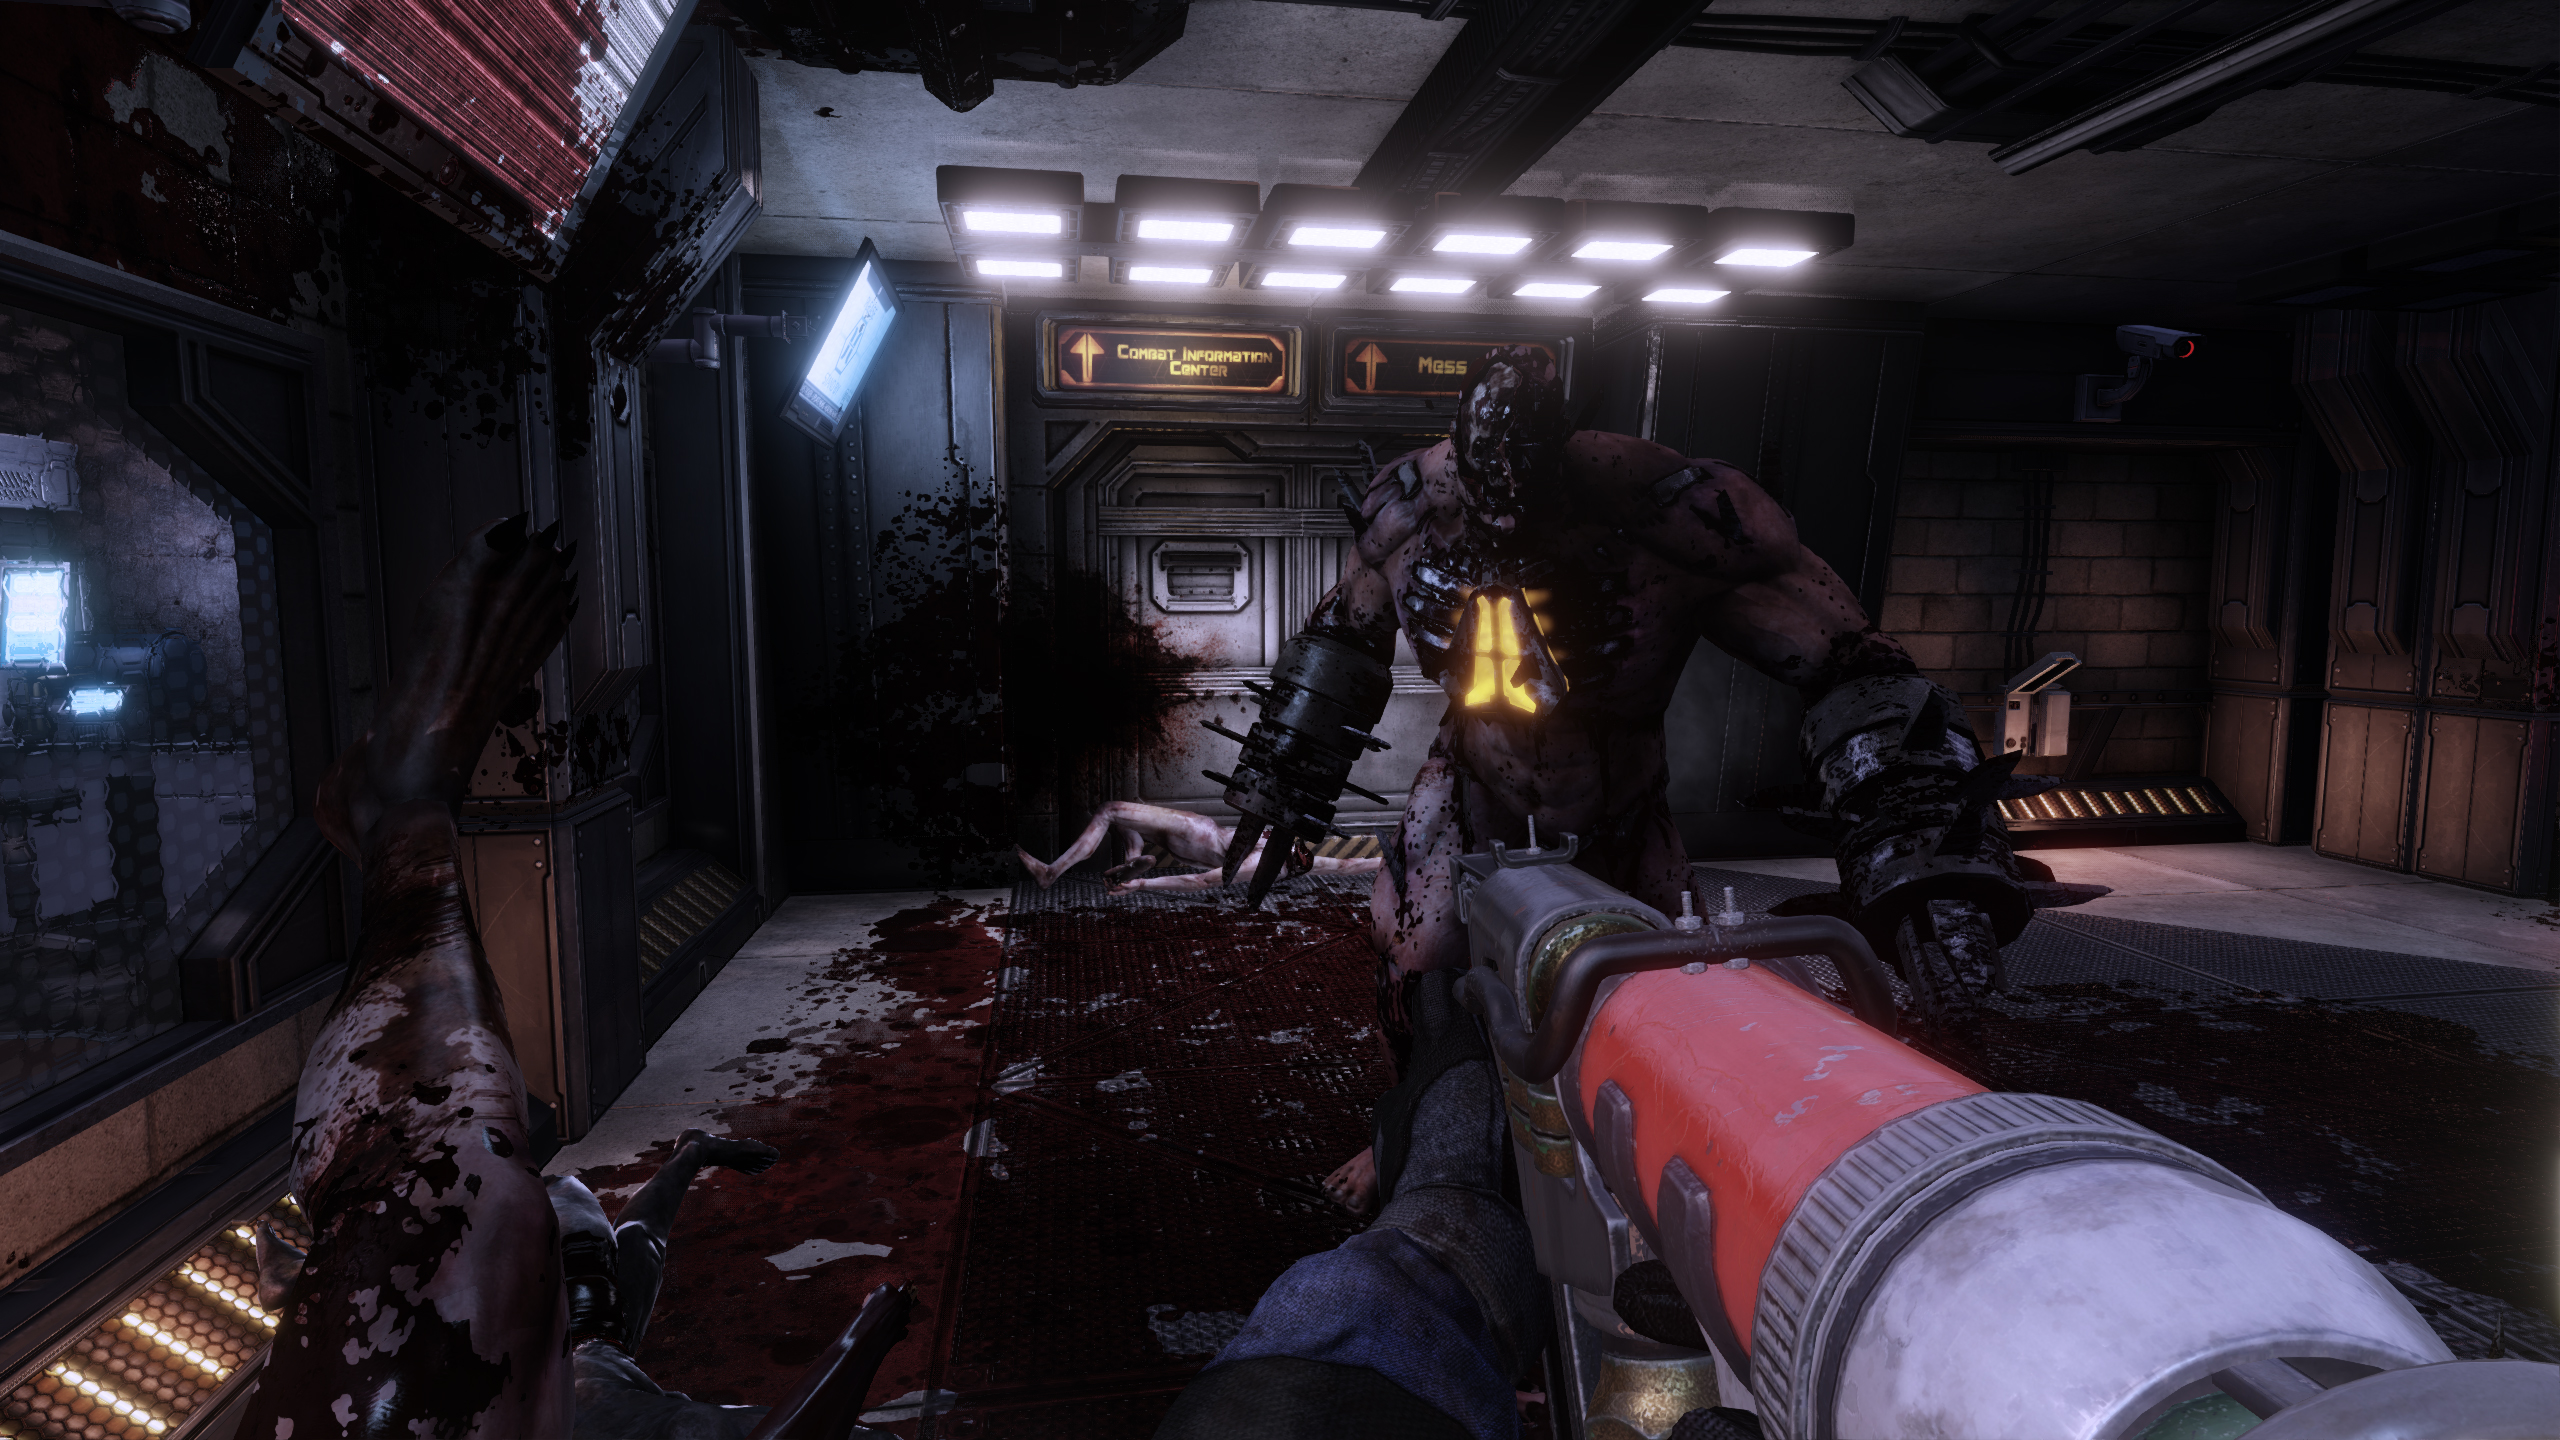 Čerstvá várka krvavých screenshotů z Killing Floor 2 105162